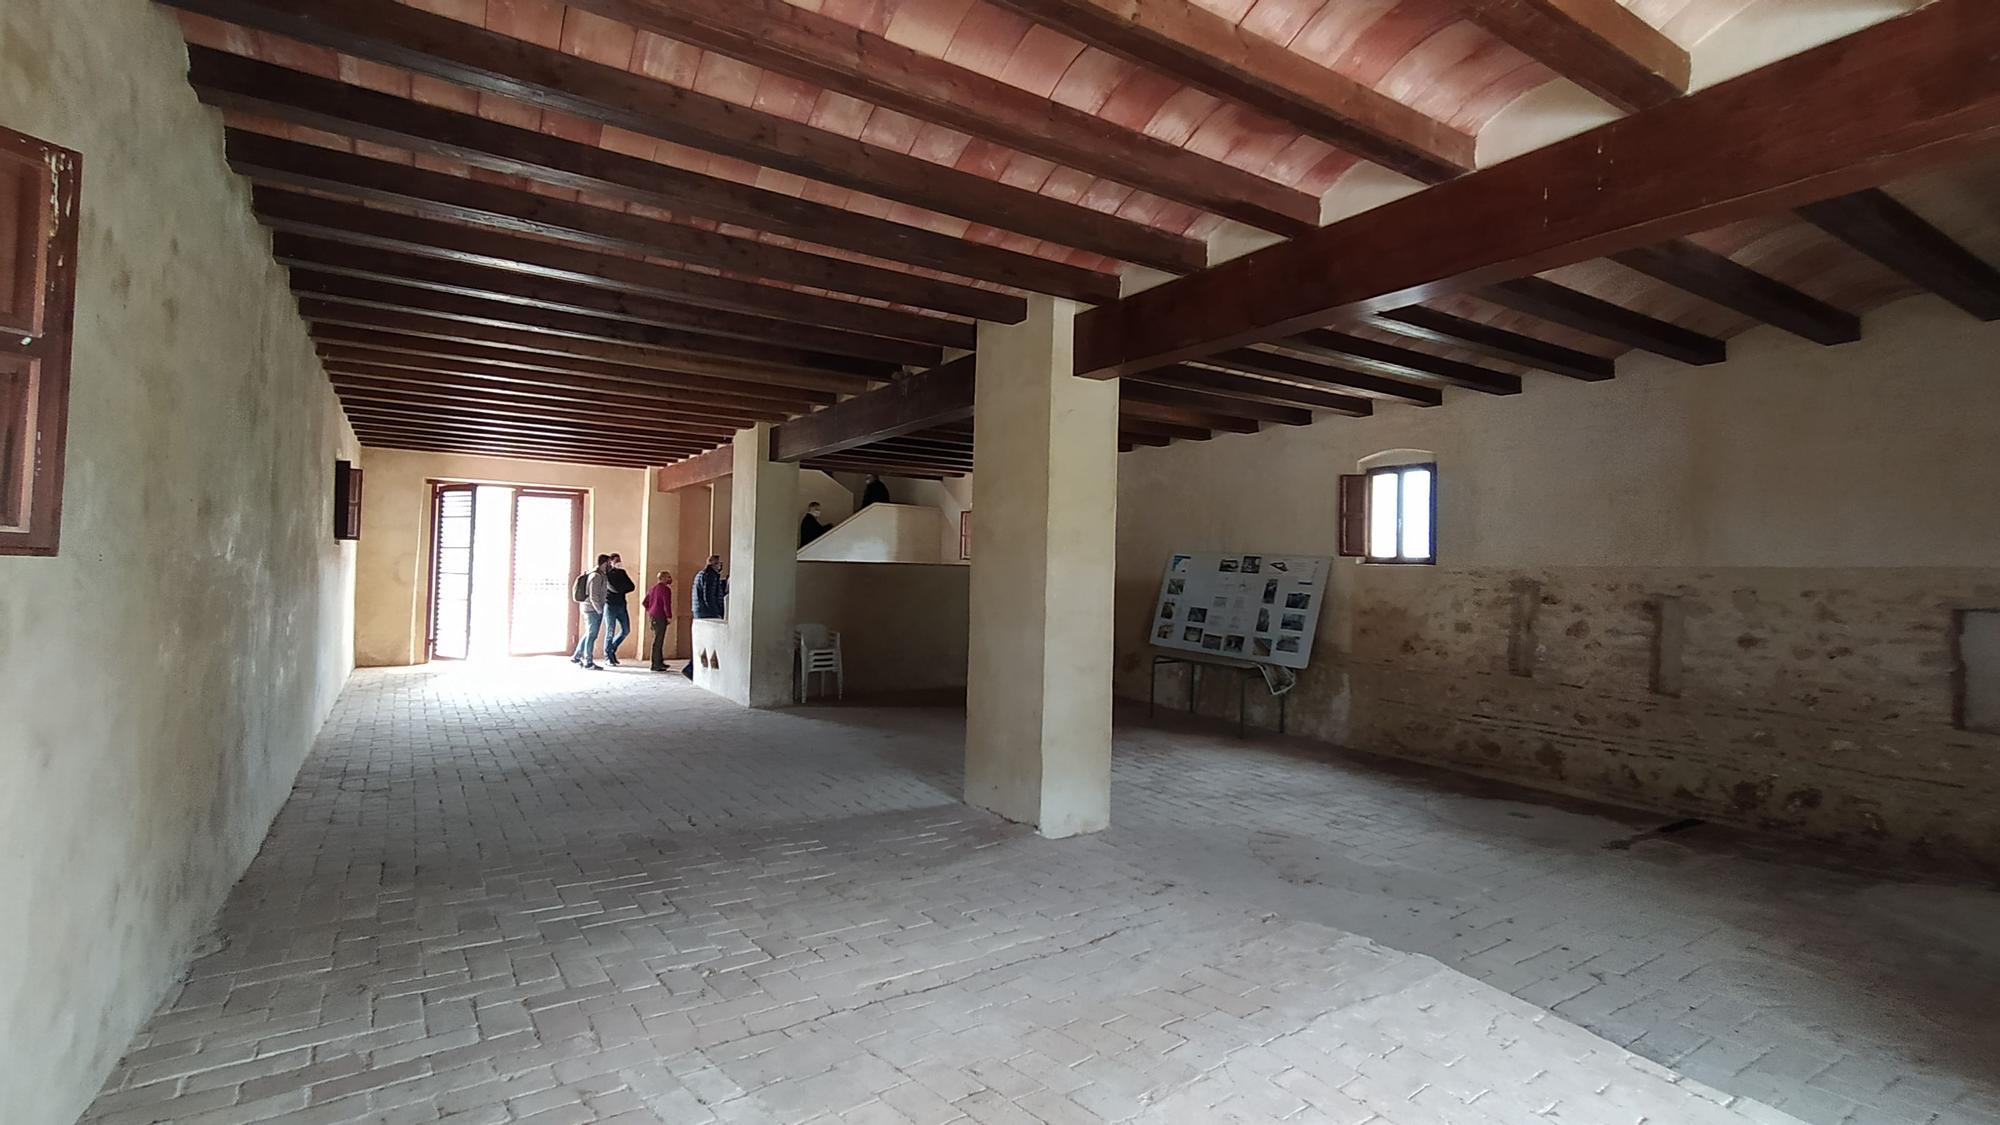 Vista general de la planta baja del molino